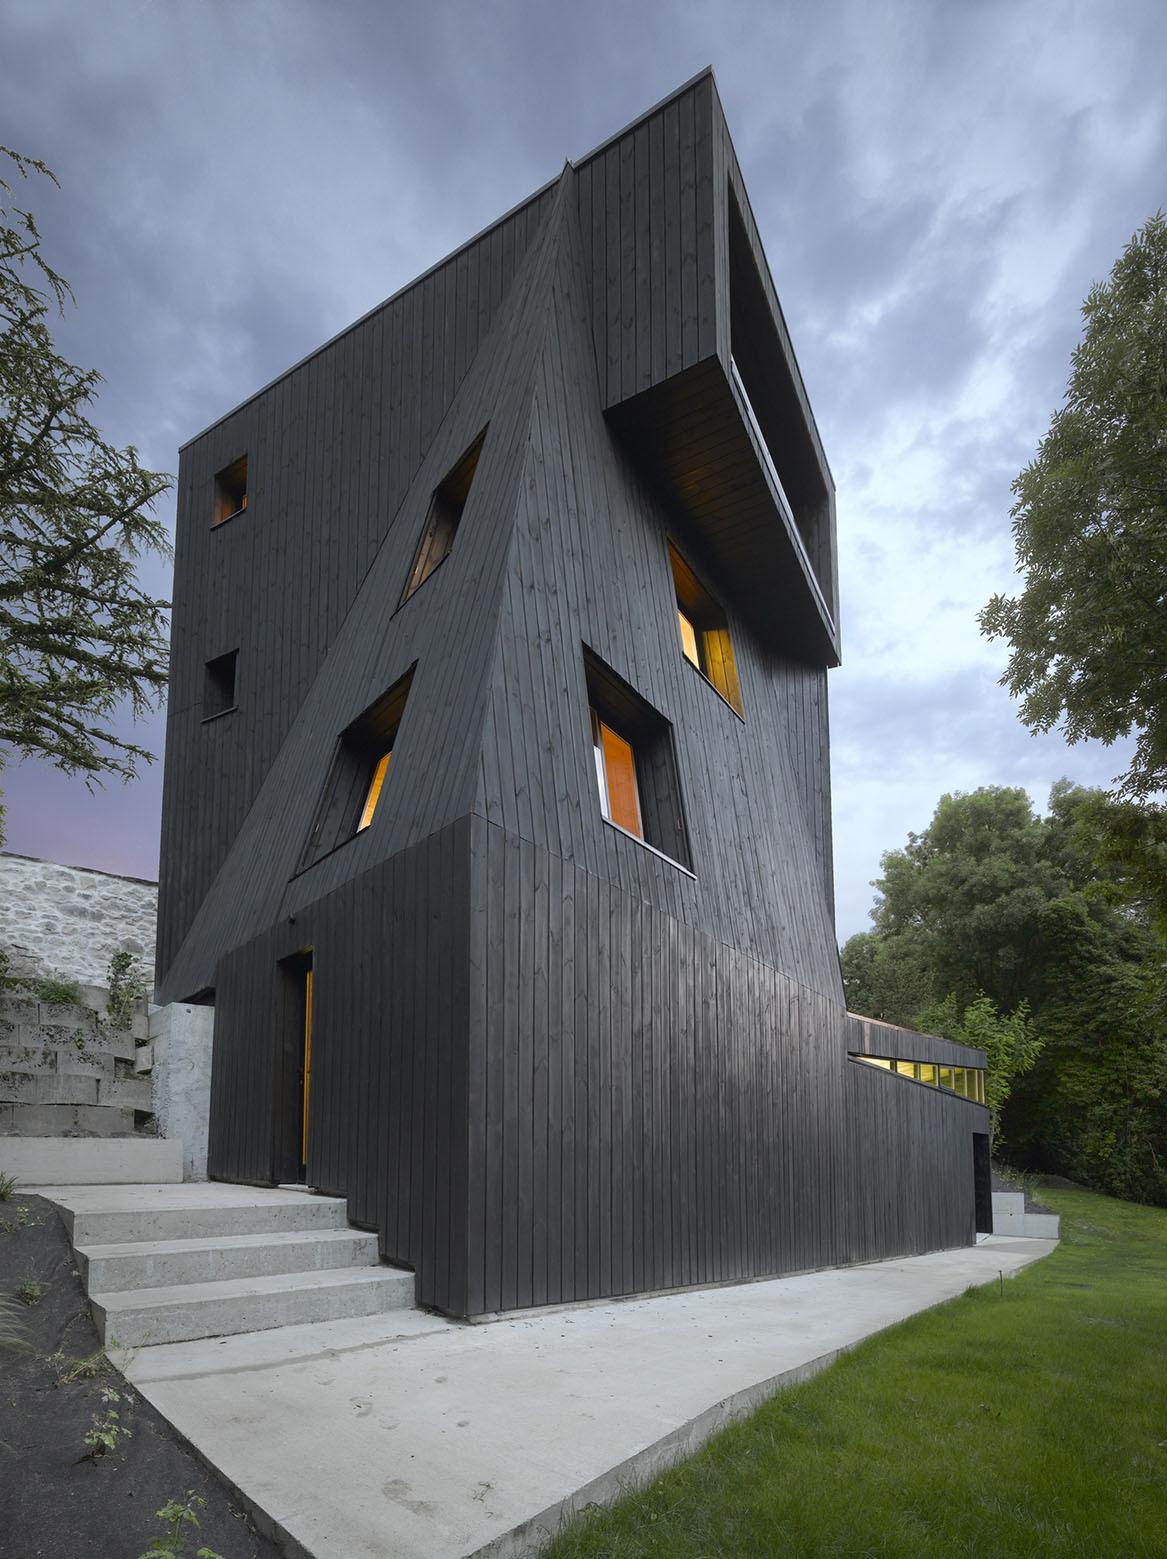 Residencia saint ange studio odile decq plataforma for Plataforma arquitectura